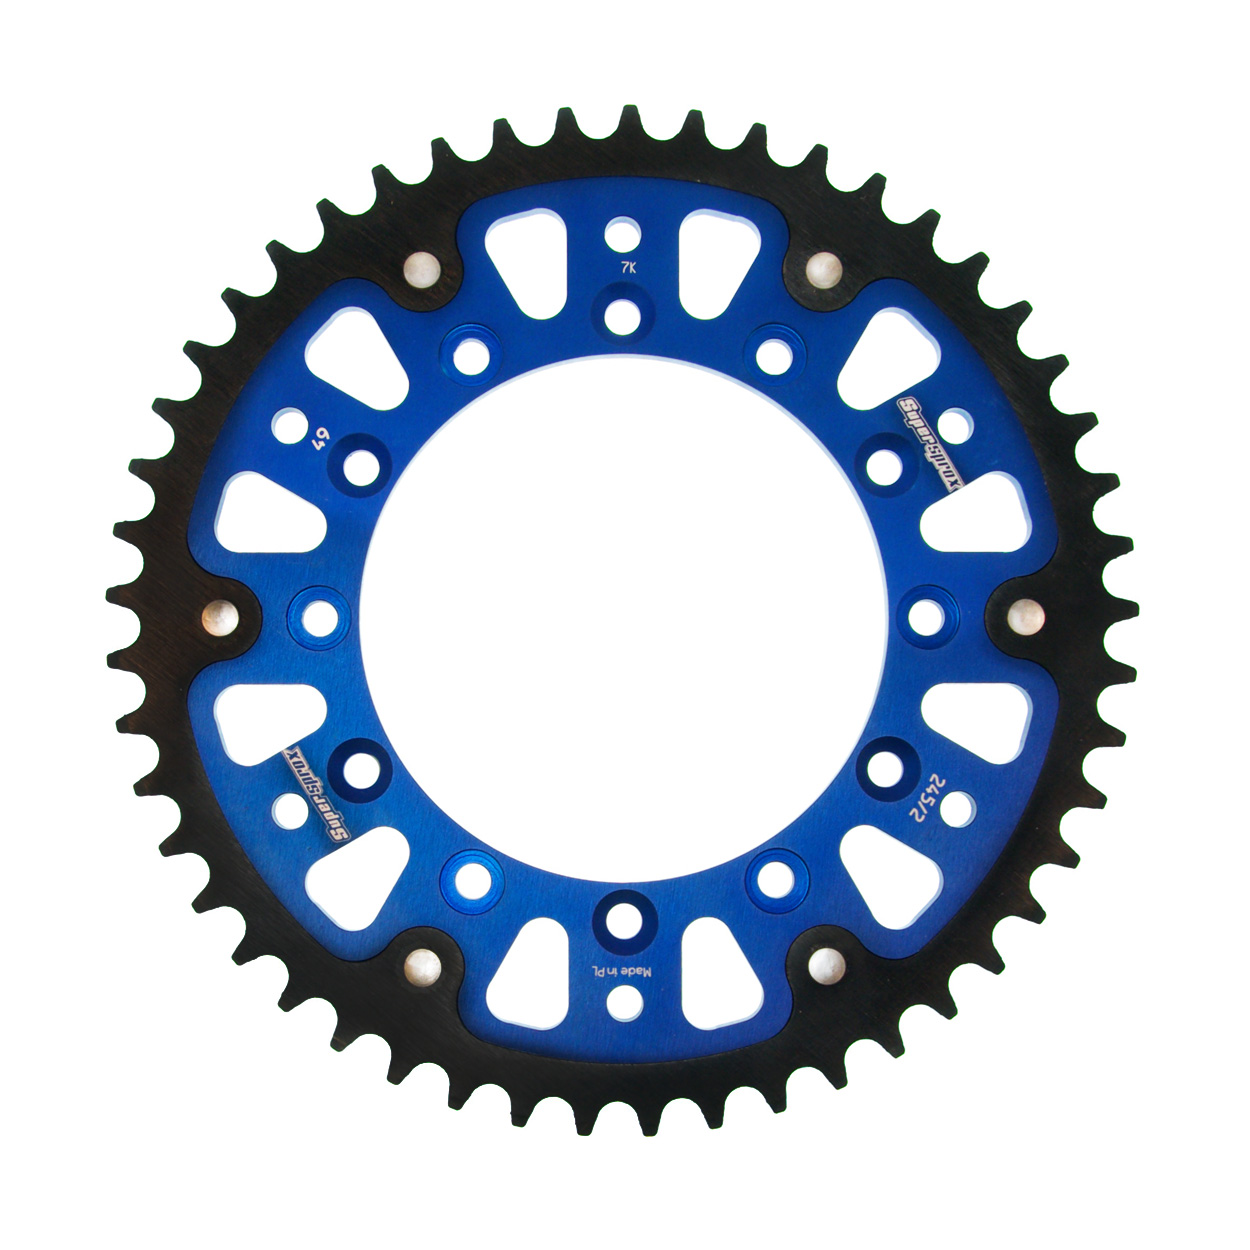 Stealth-Kettenrad Supersprox 520 - 49Z (blau)